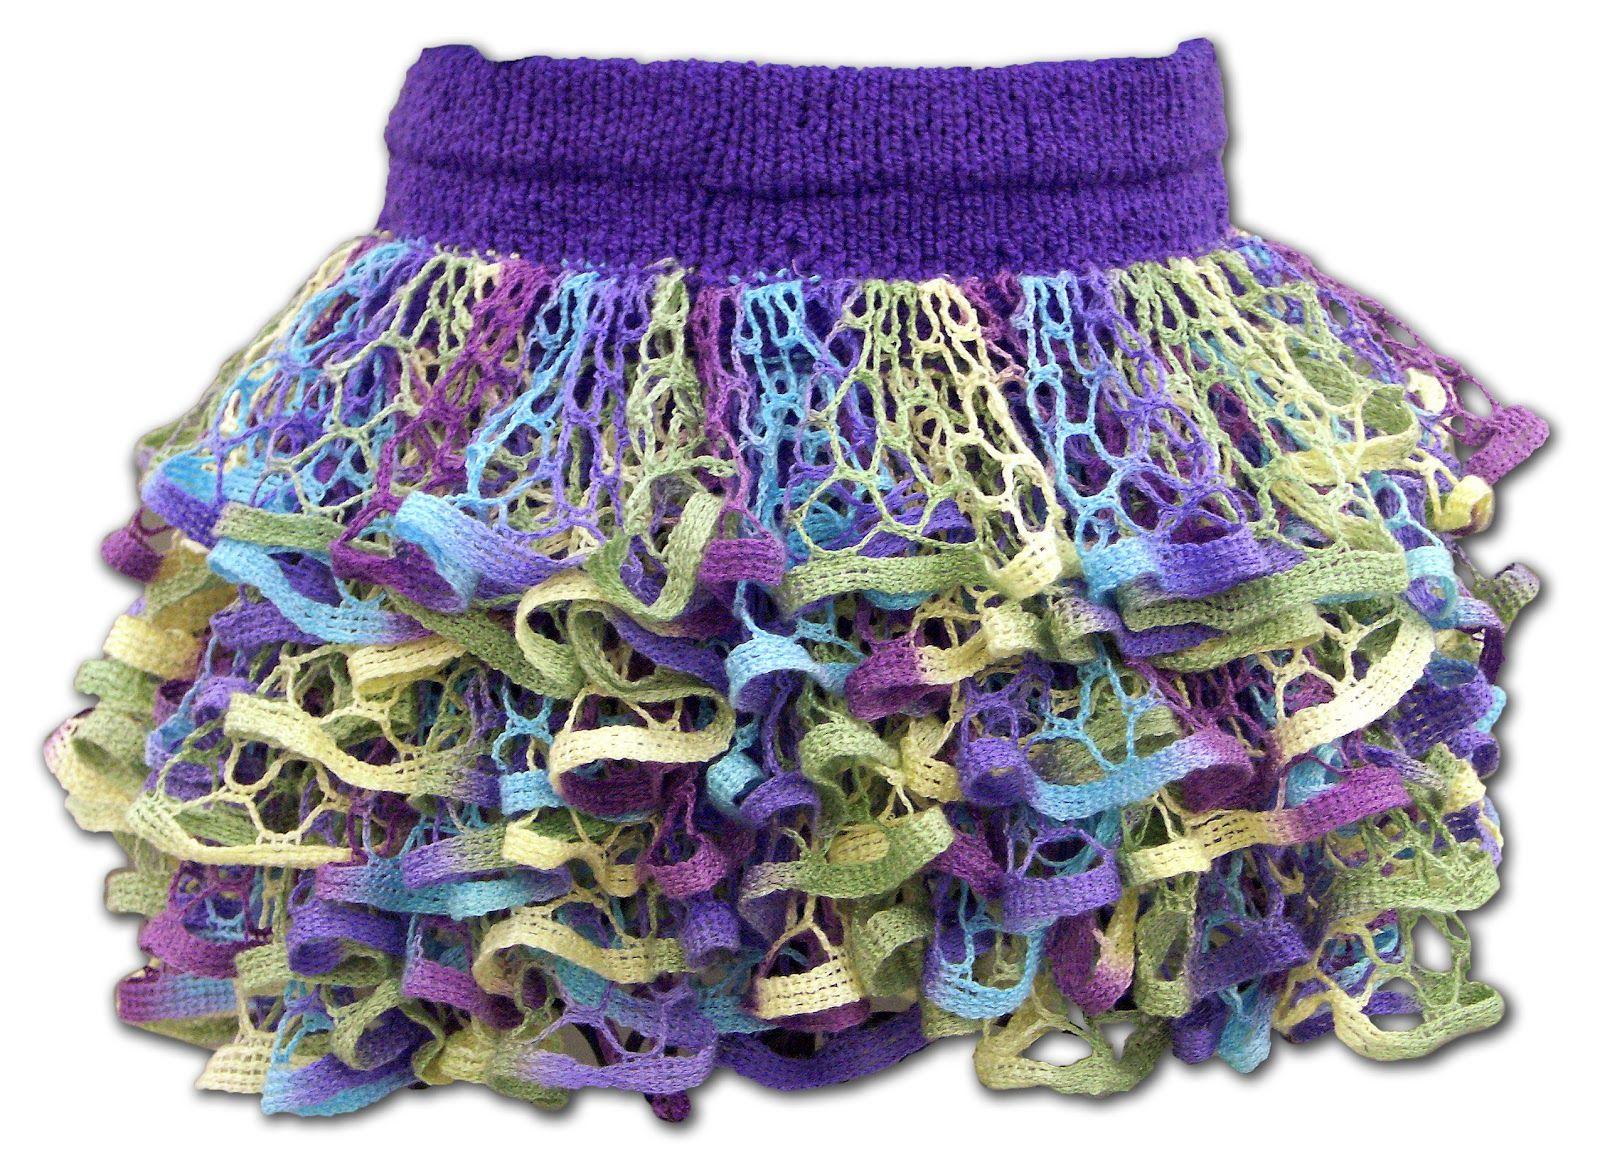 Ruffle yarns beyond the scarf free patterns to knit and crochet ruffle yarns beyond the scarf free patterns to knit and crochet dt1010fo